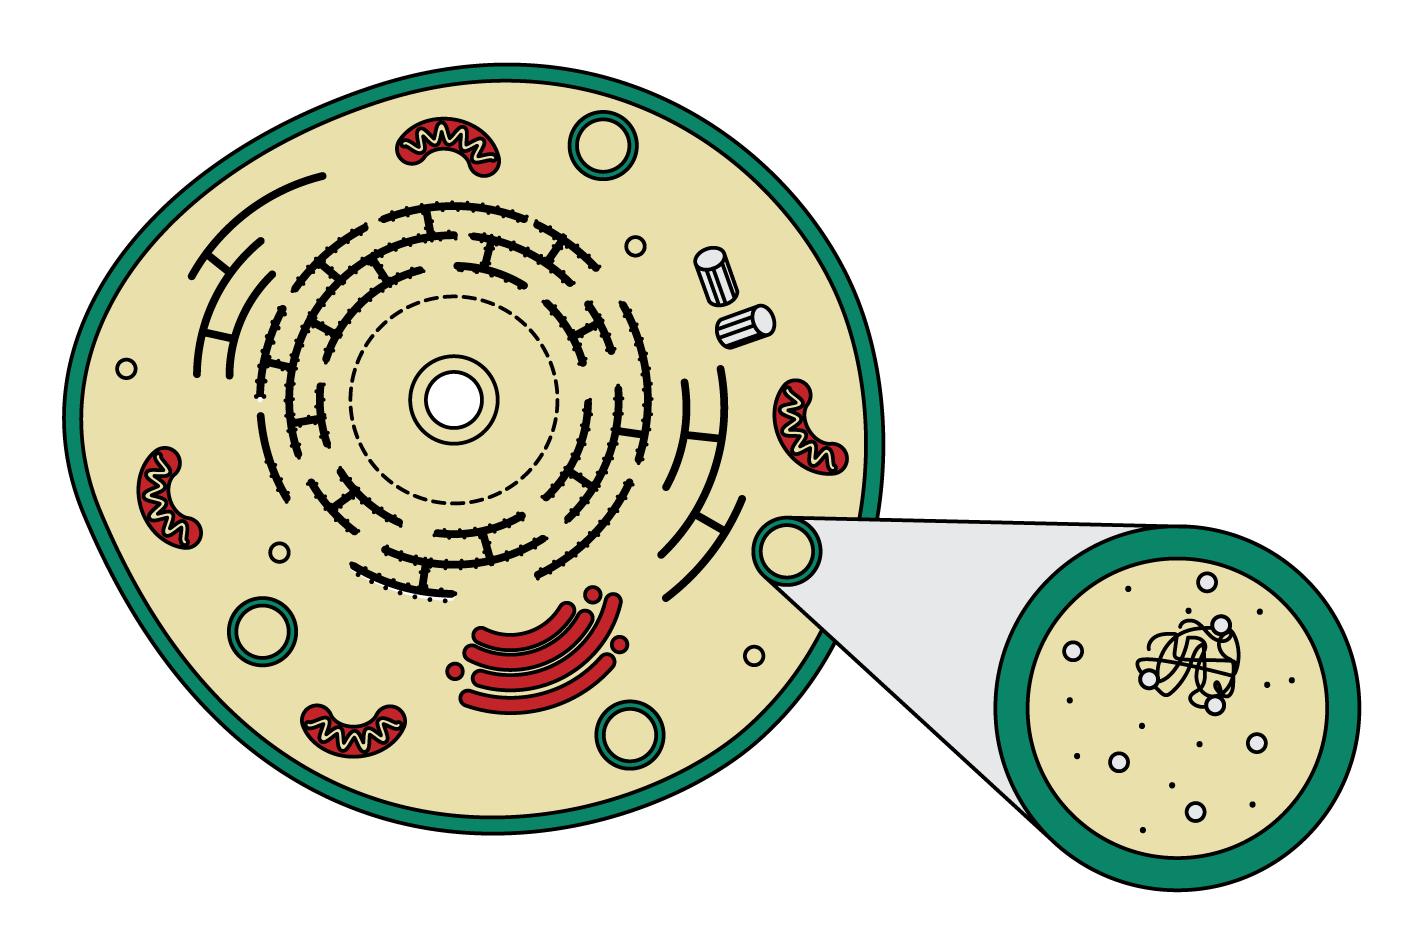 Figure 1: A visual representation of a Gaucher cell.